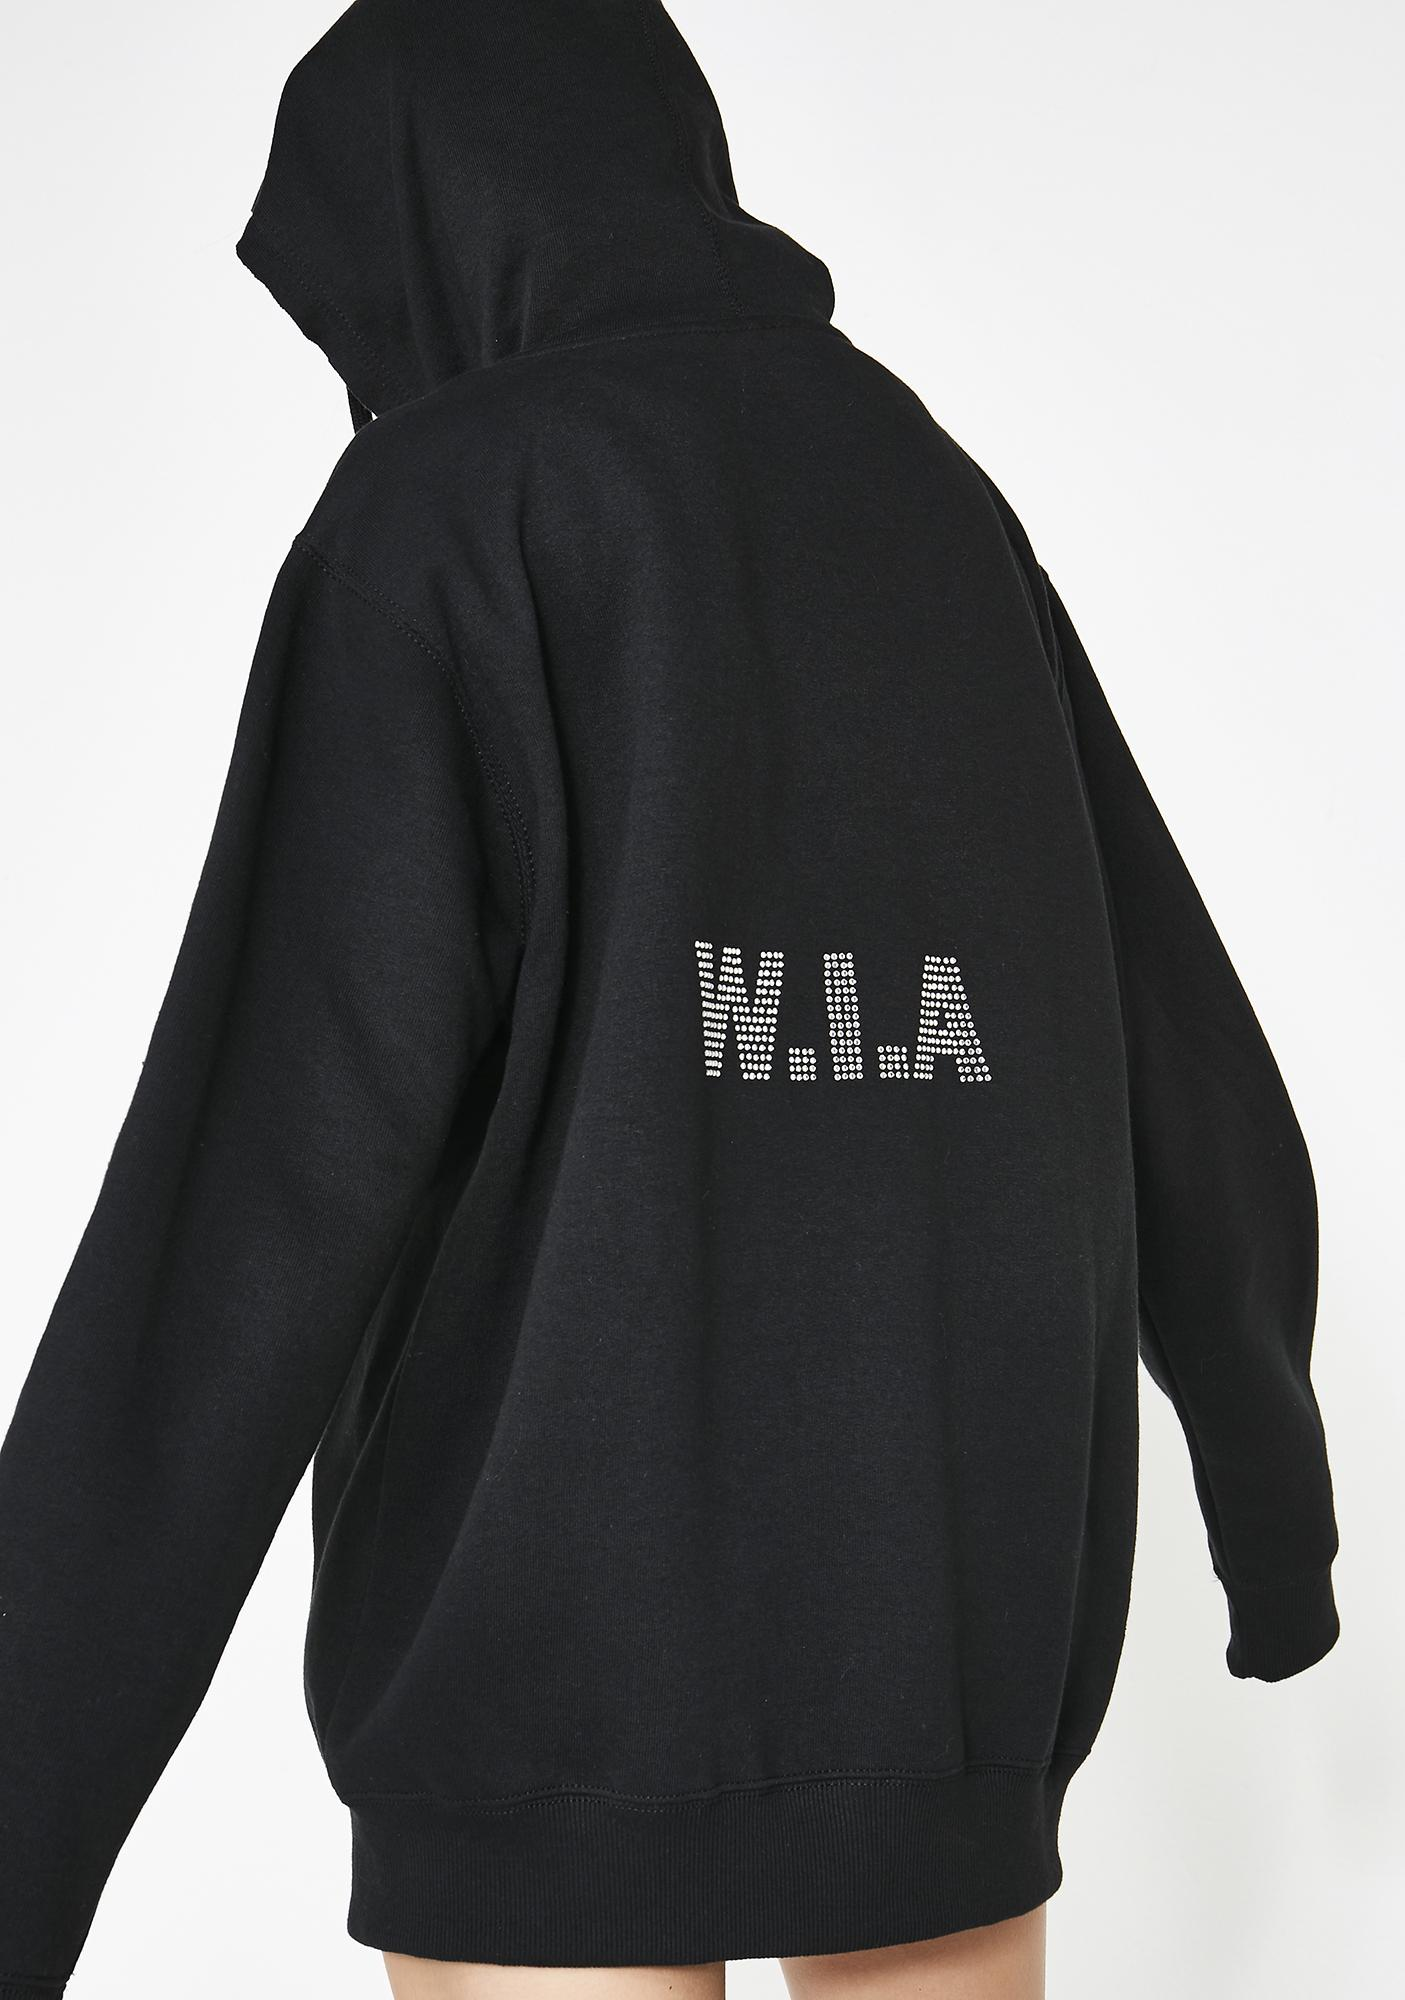 W.I.A Perturbed Zip Up Hoodie